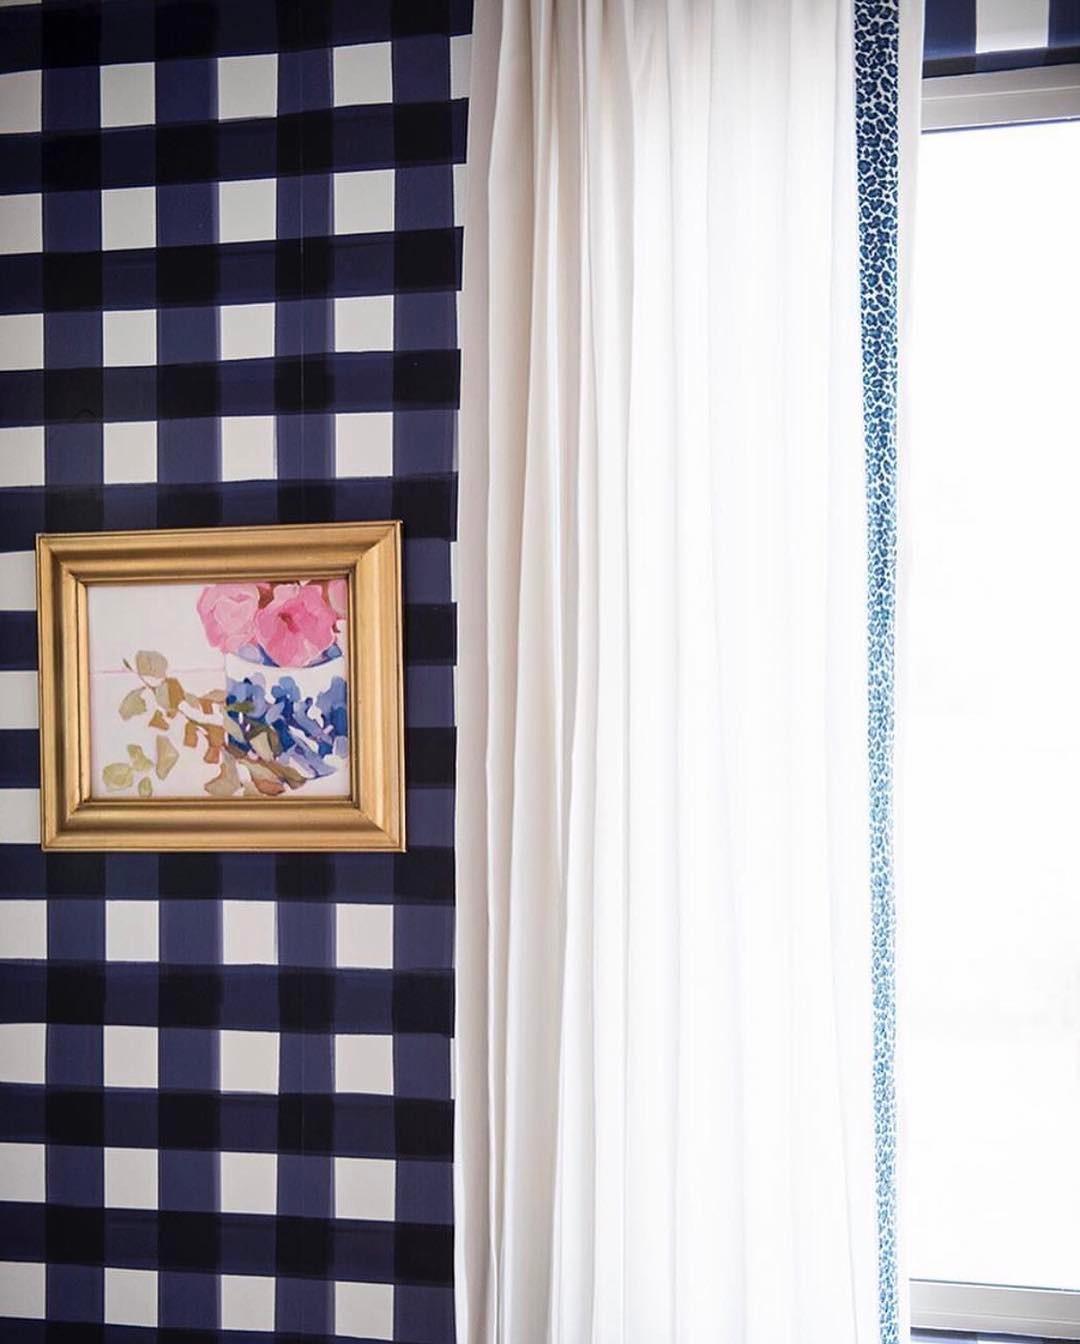 Burnside-Buffalo-Check-in-Navy-Caitlin-Wilson-wallpaper-wp3004018